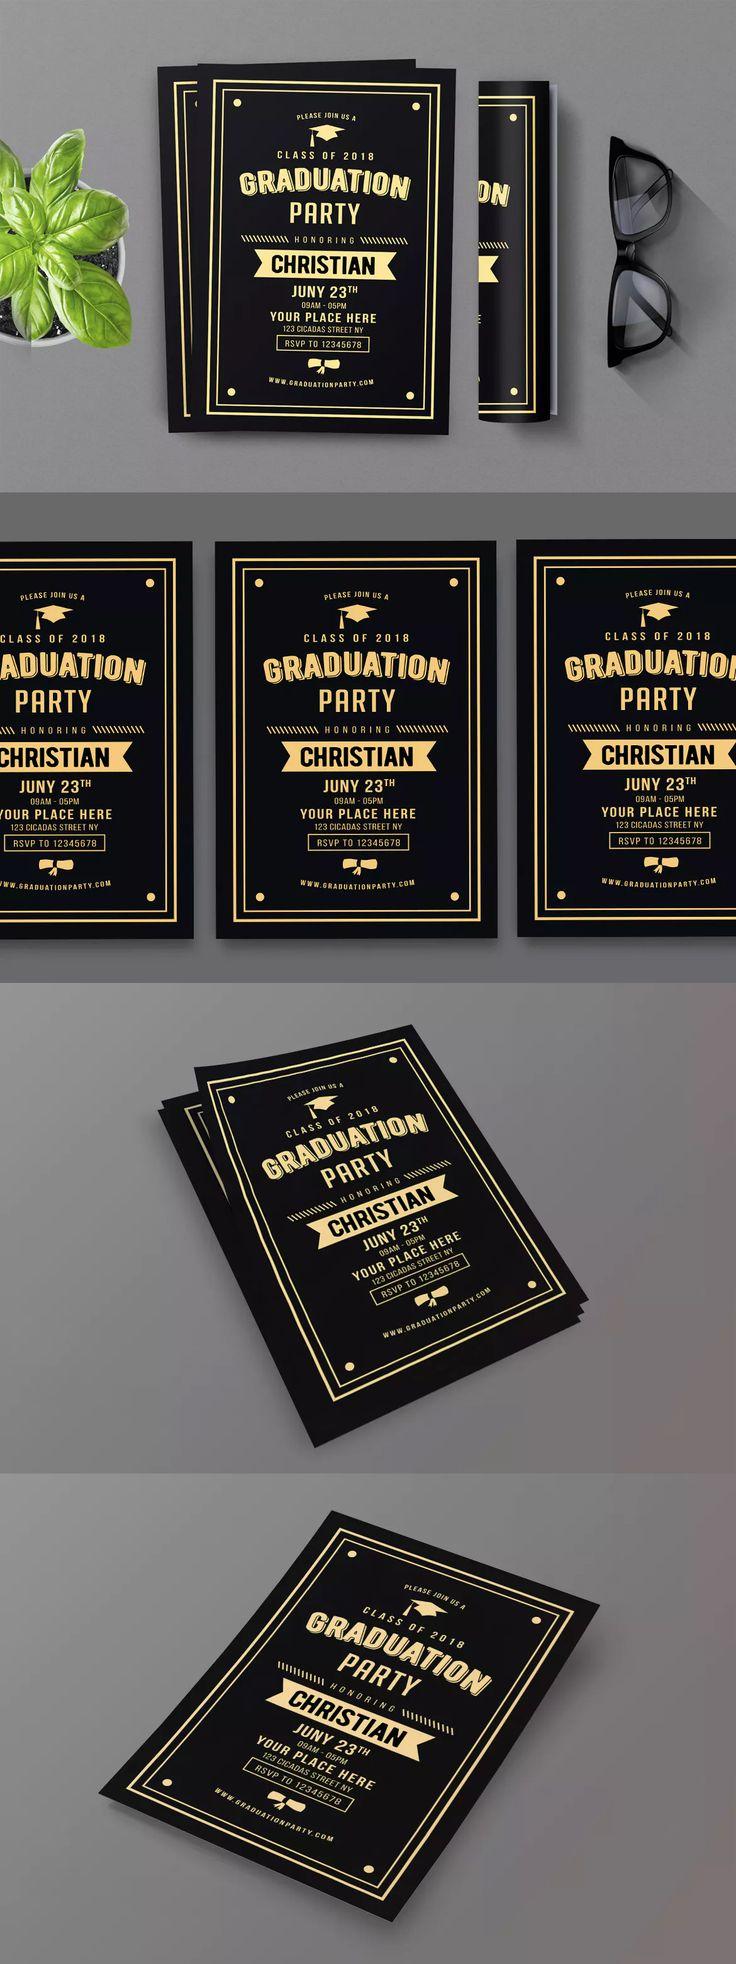 59 best Invitation Card Templates images on Pinterest